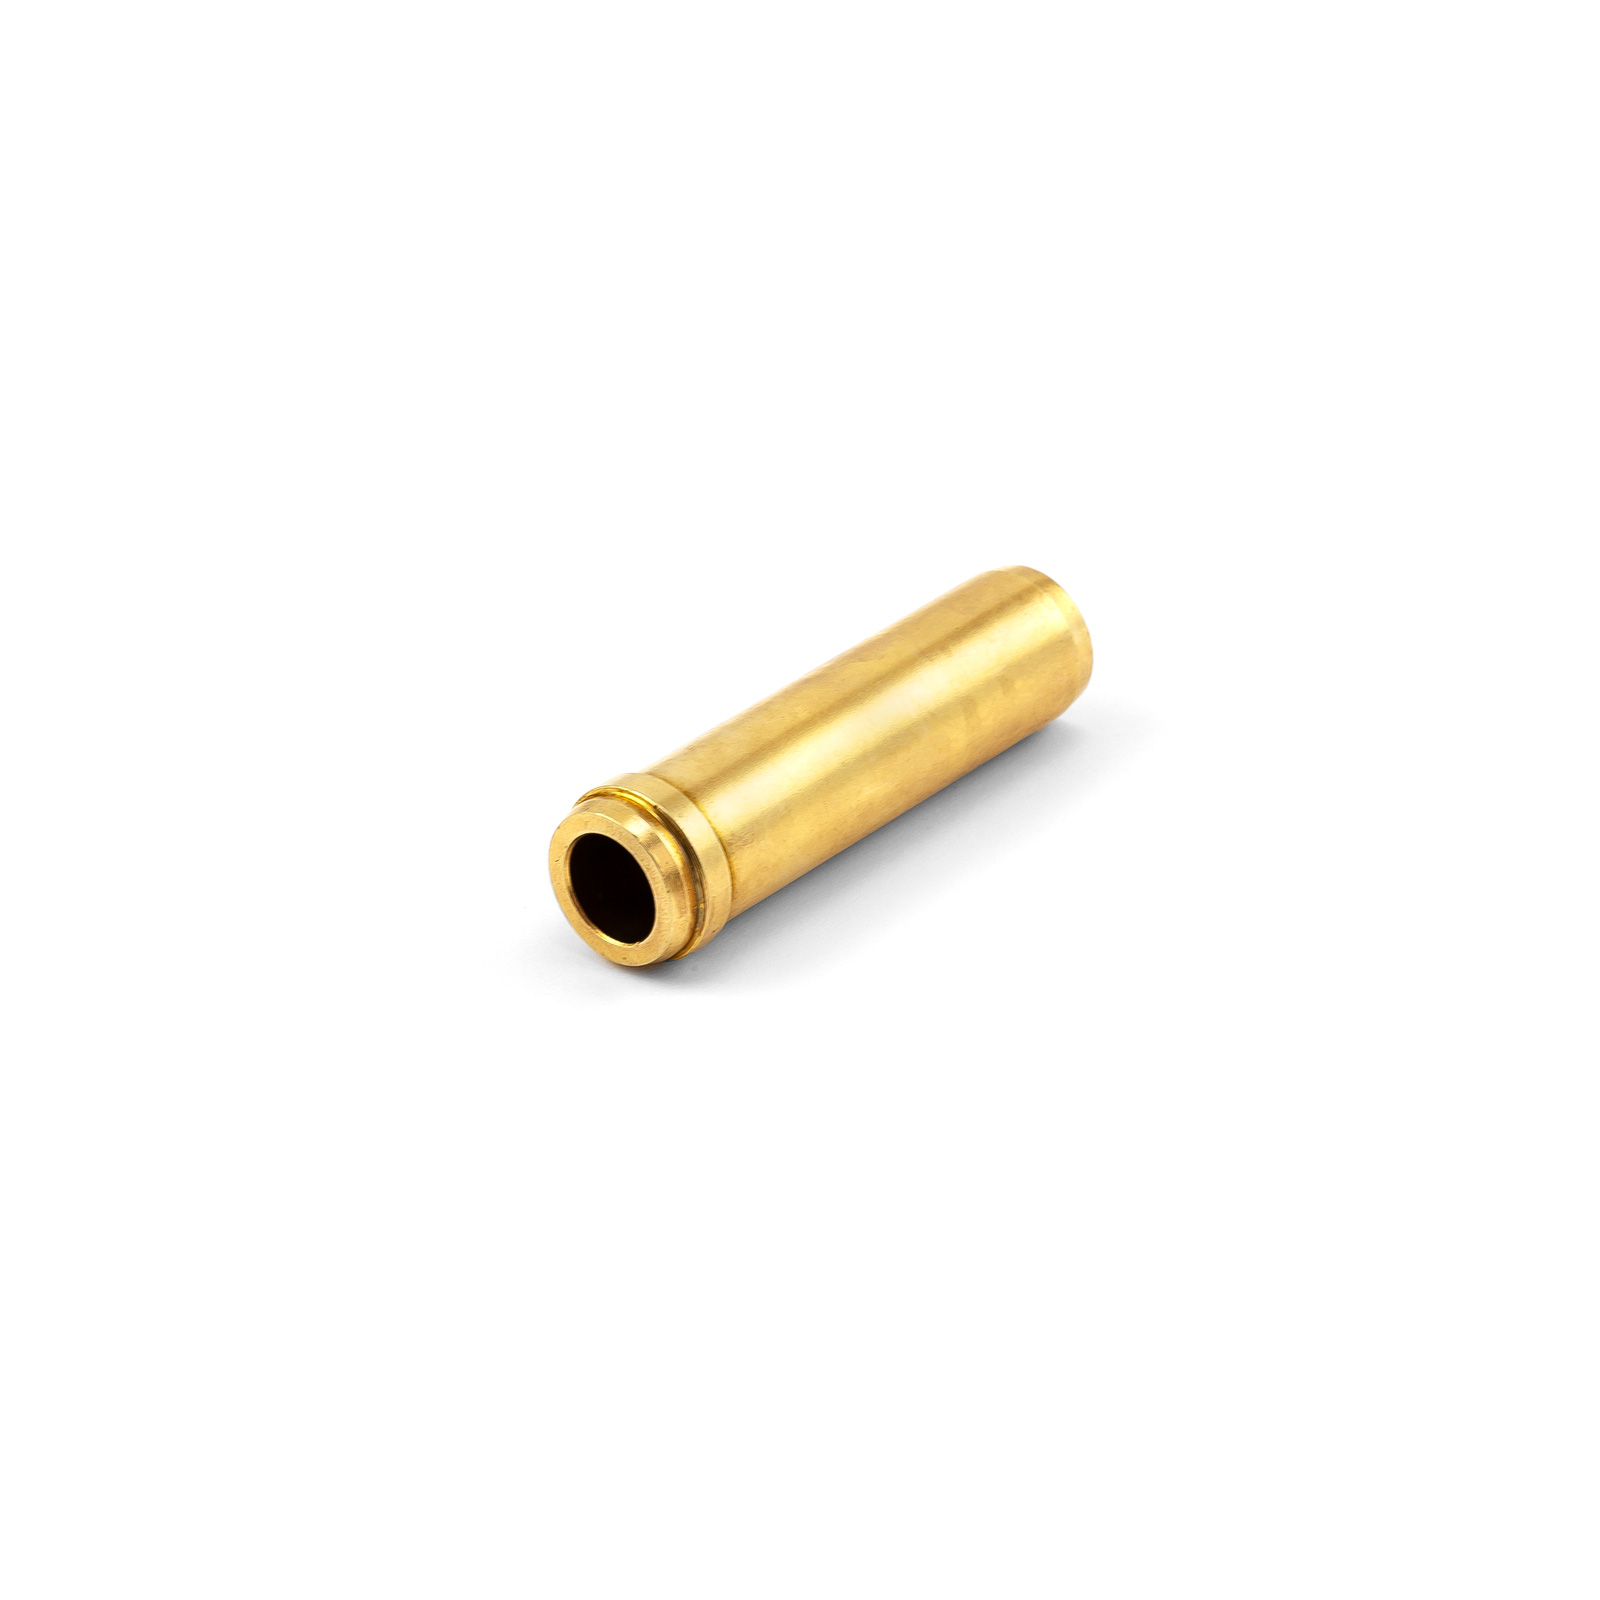 "0.622"" OD | 0.414"" ID | 2.407"" Length | Intake & Exhaust Steel Valve Guide"